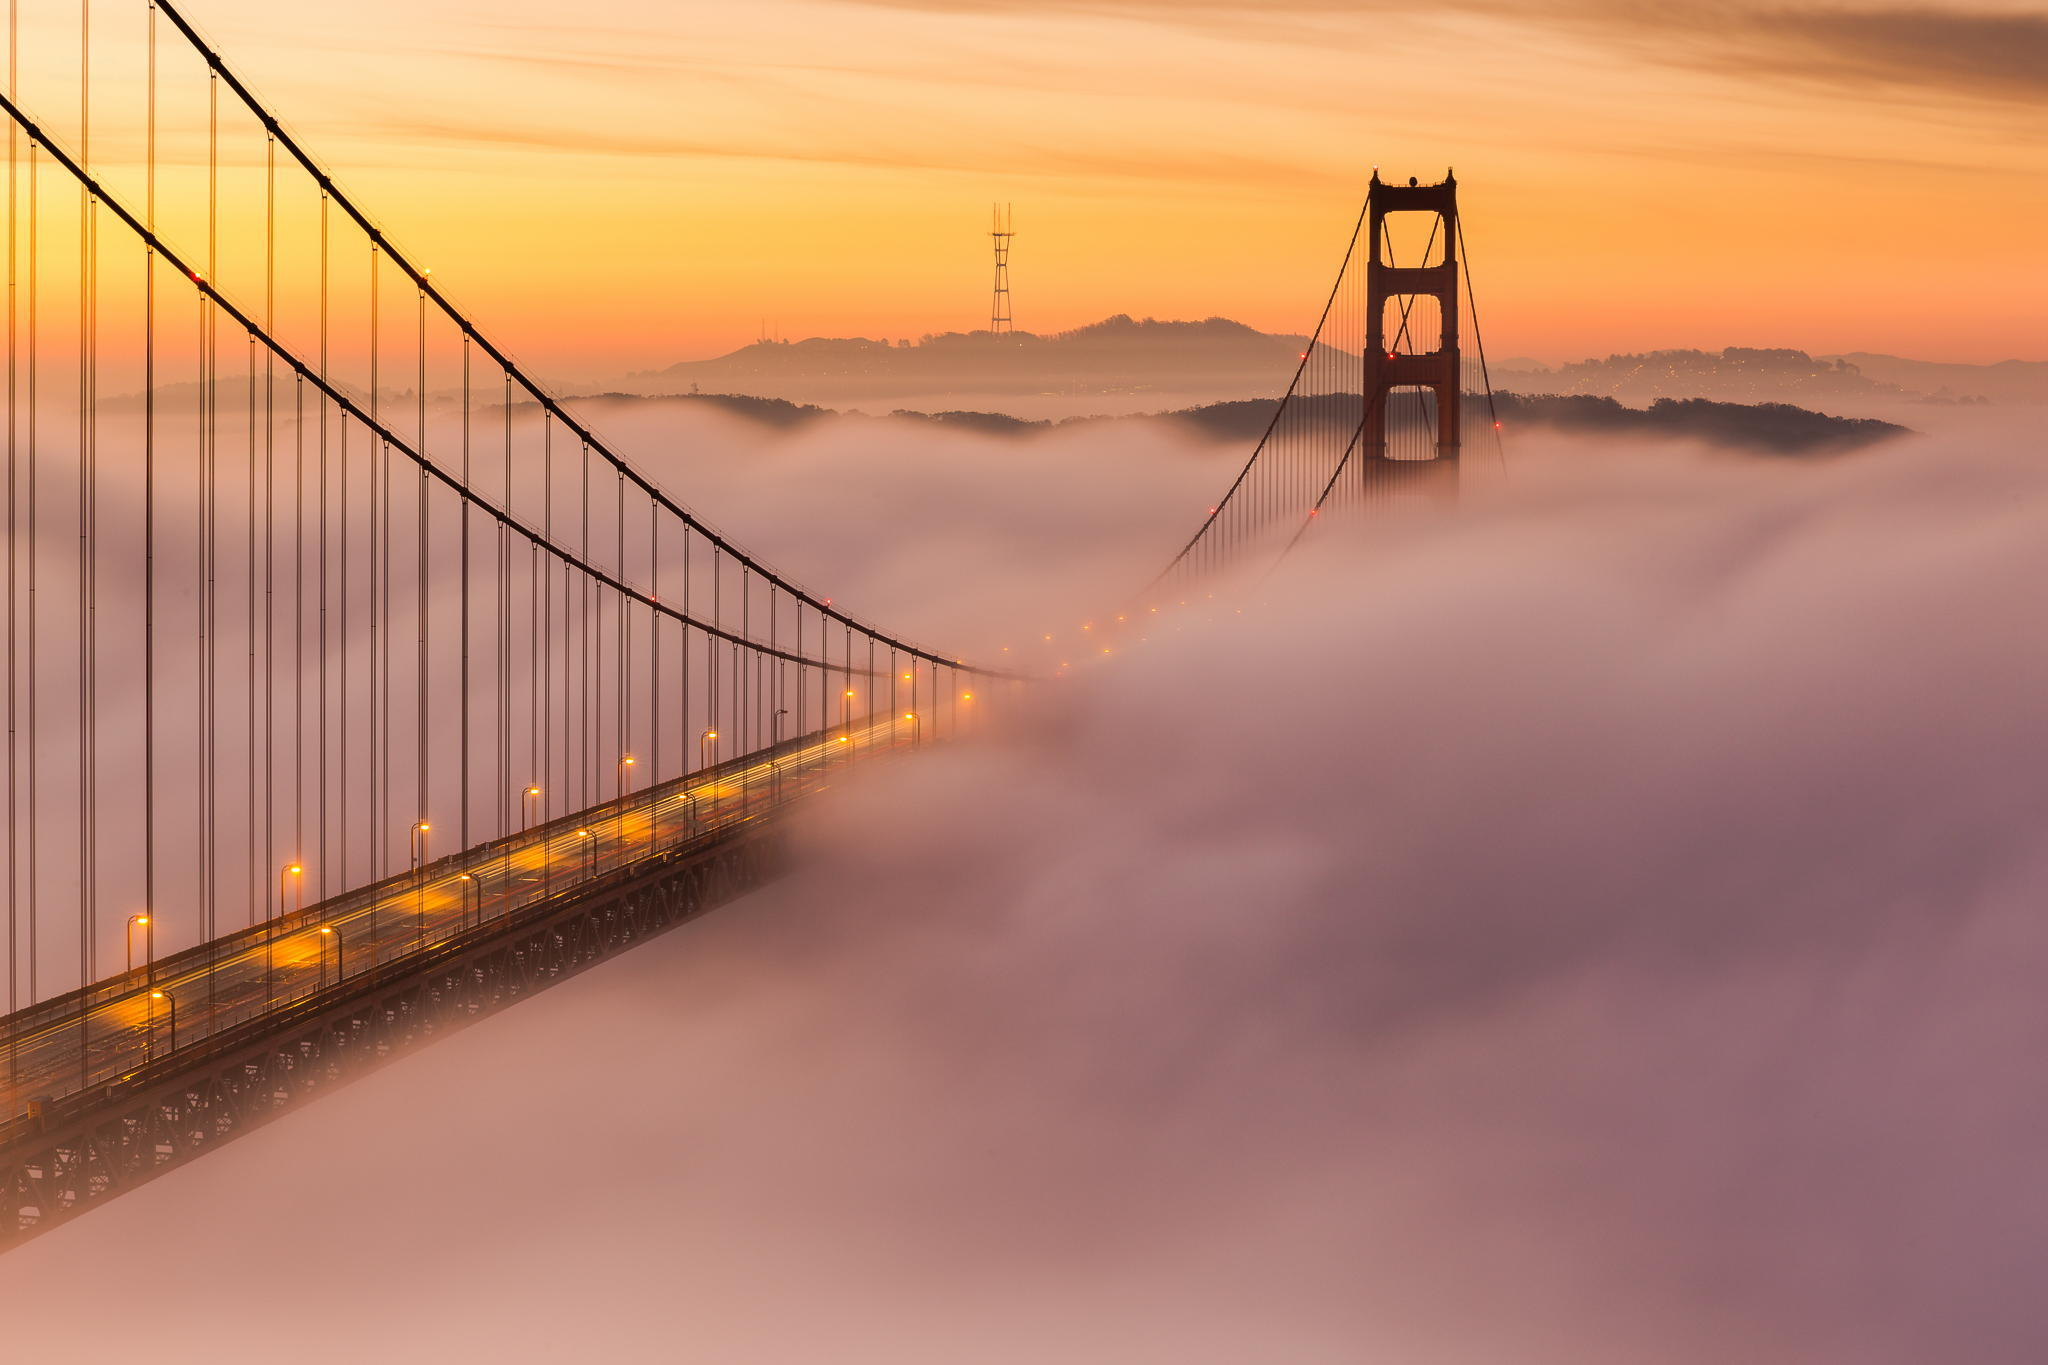 картинки тегом фотообои подвесной мост в тумане каким